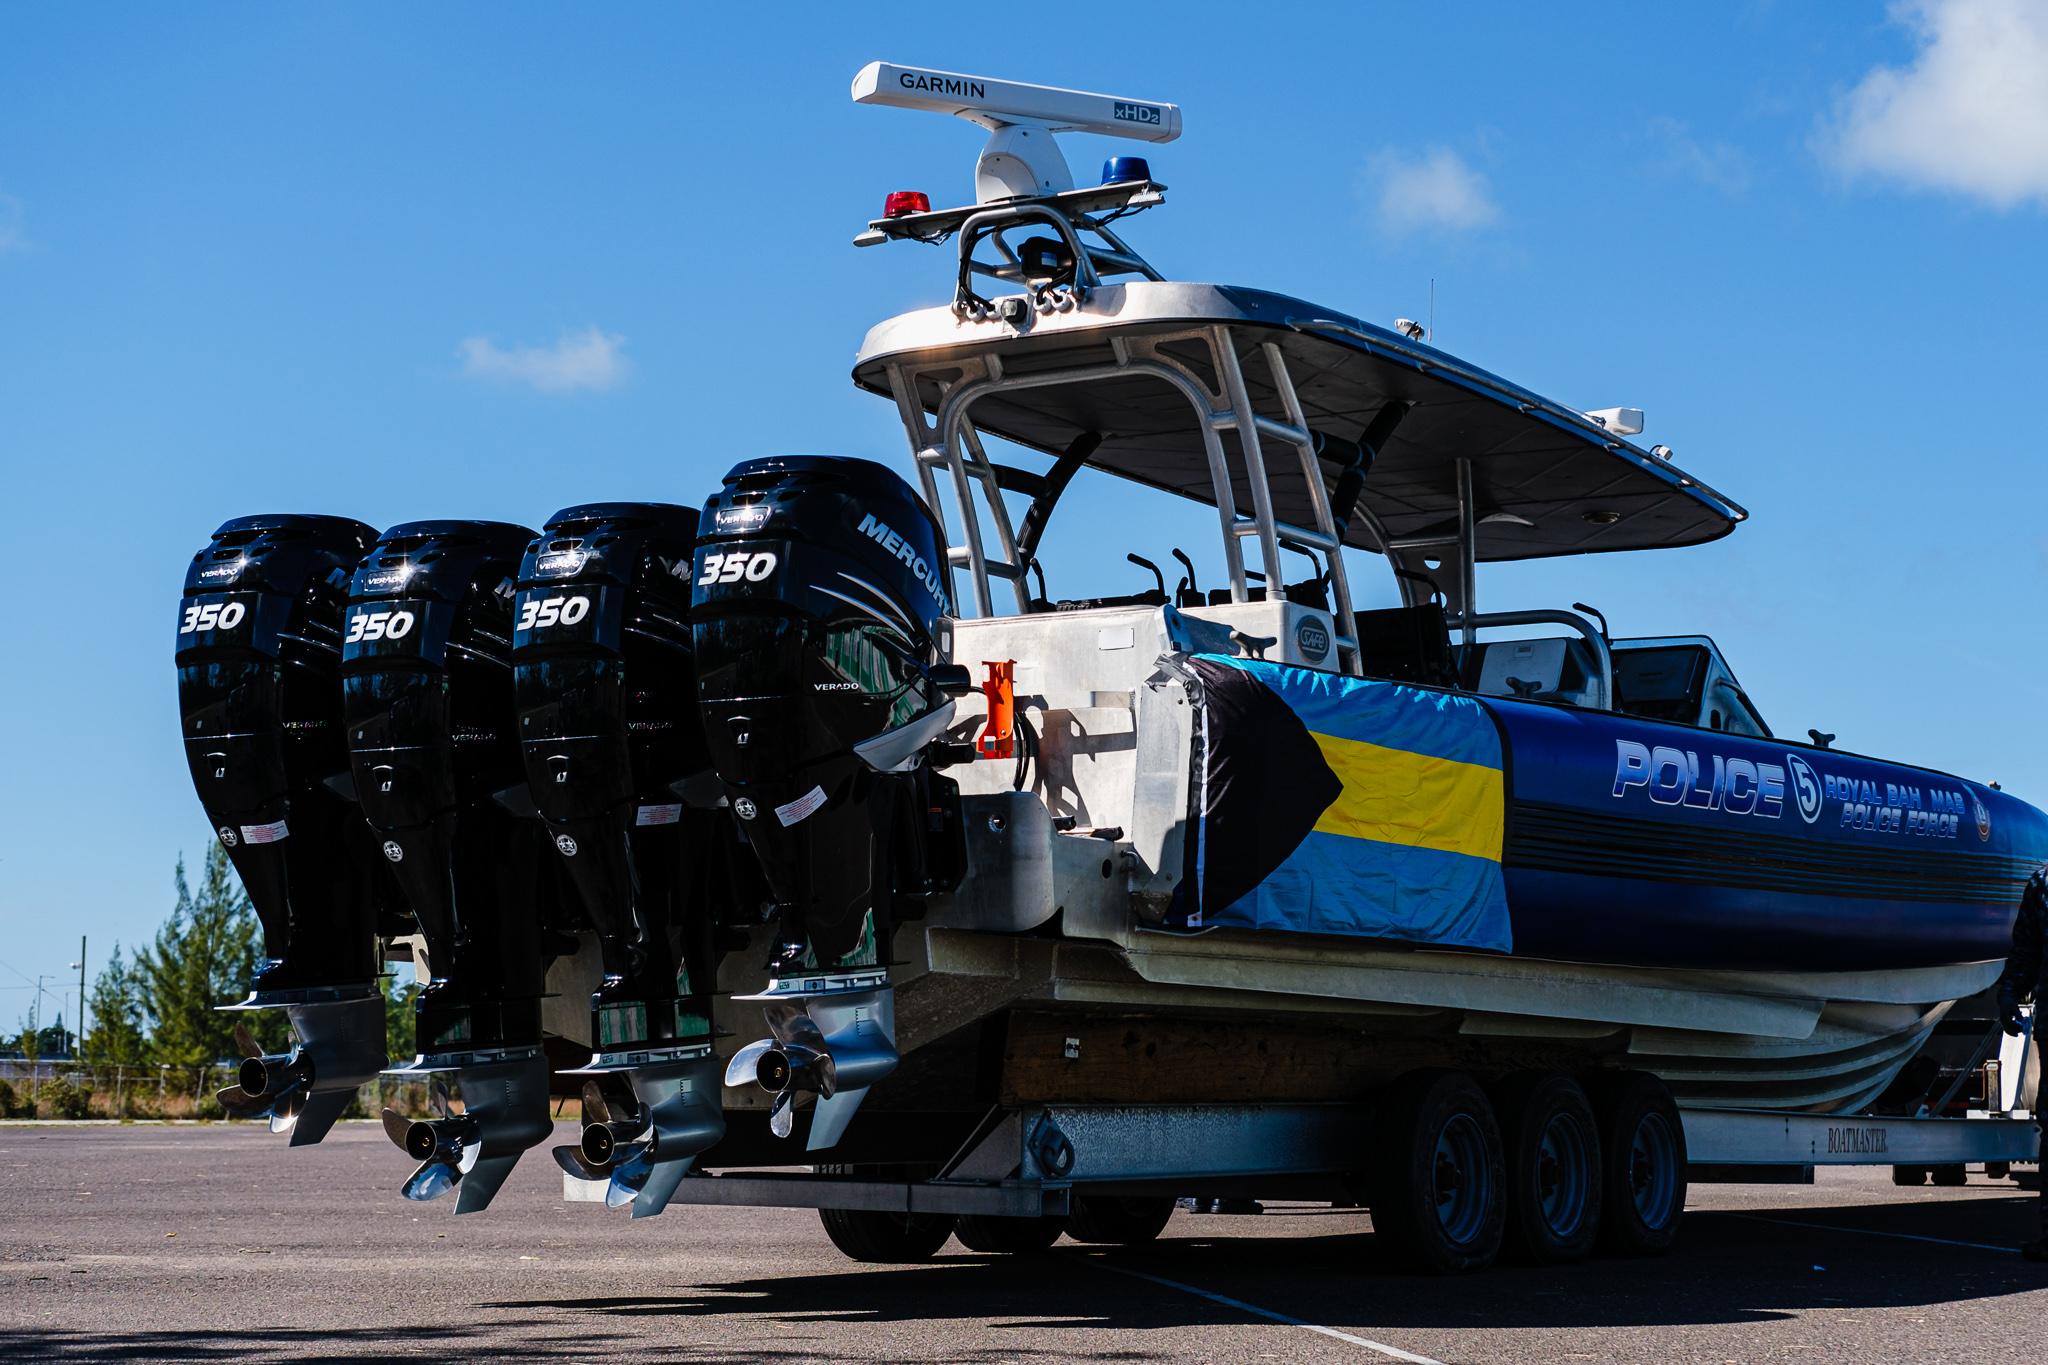 US donates six boat engines worth $168K to RBPF and Customs Marine Unit